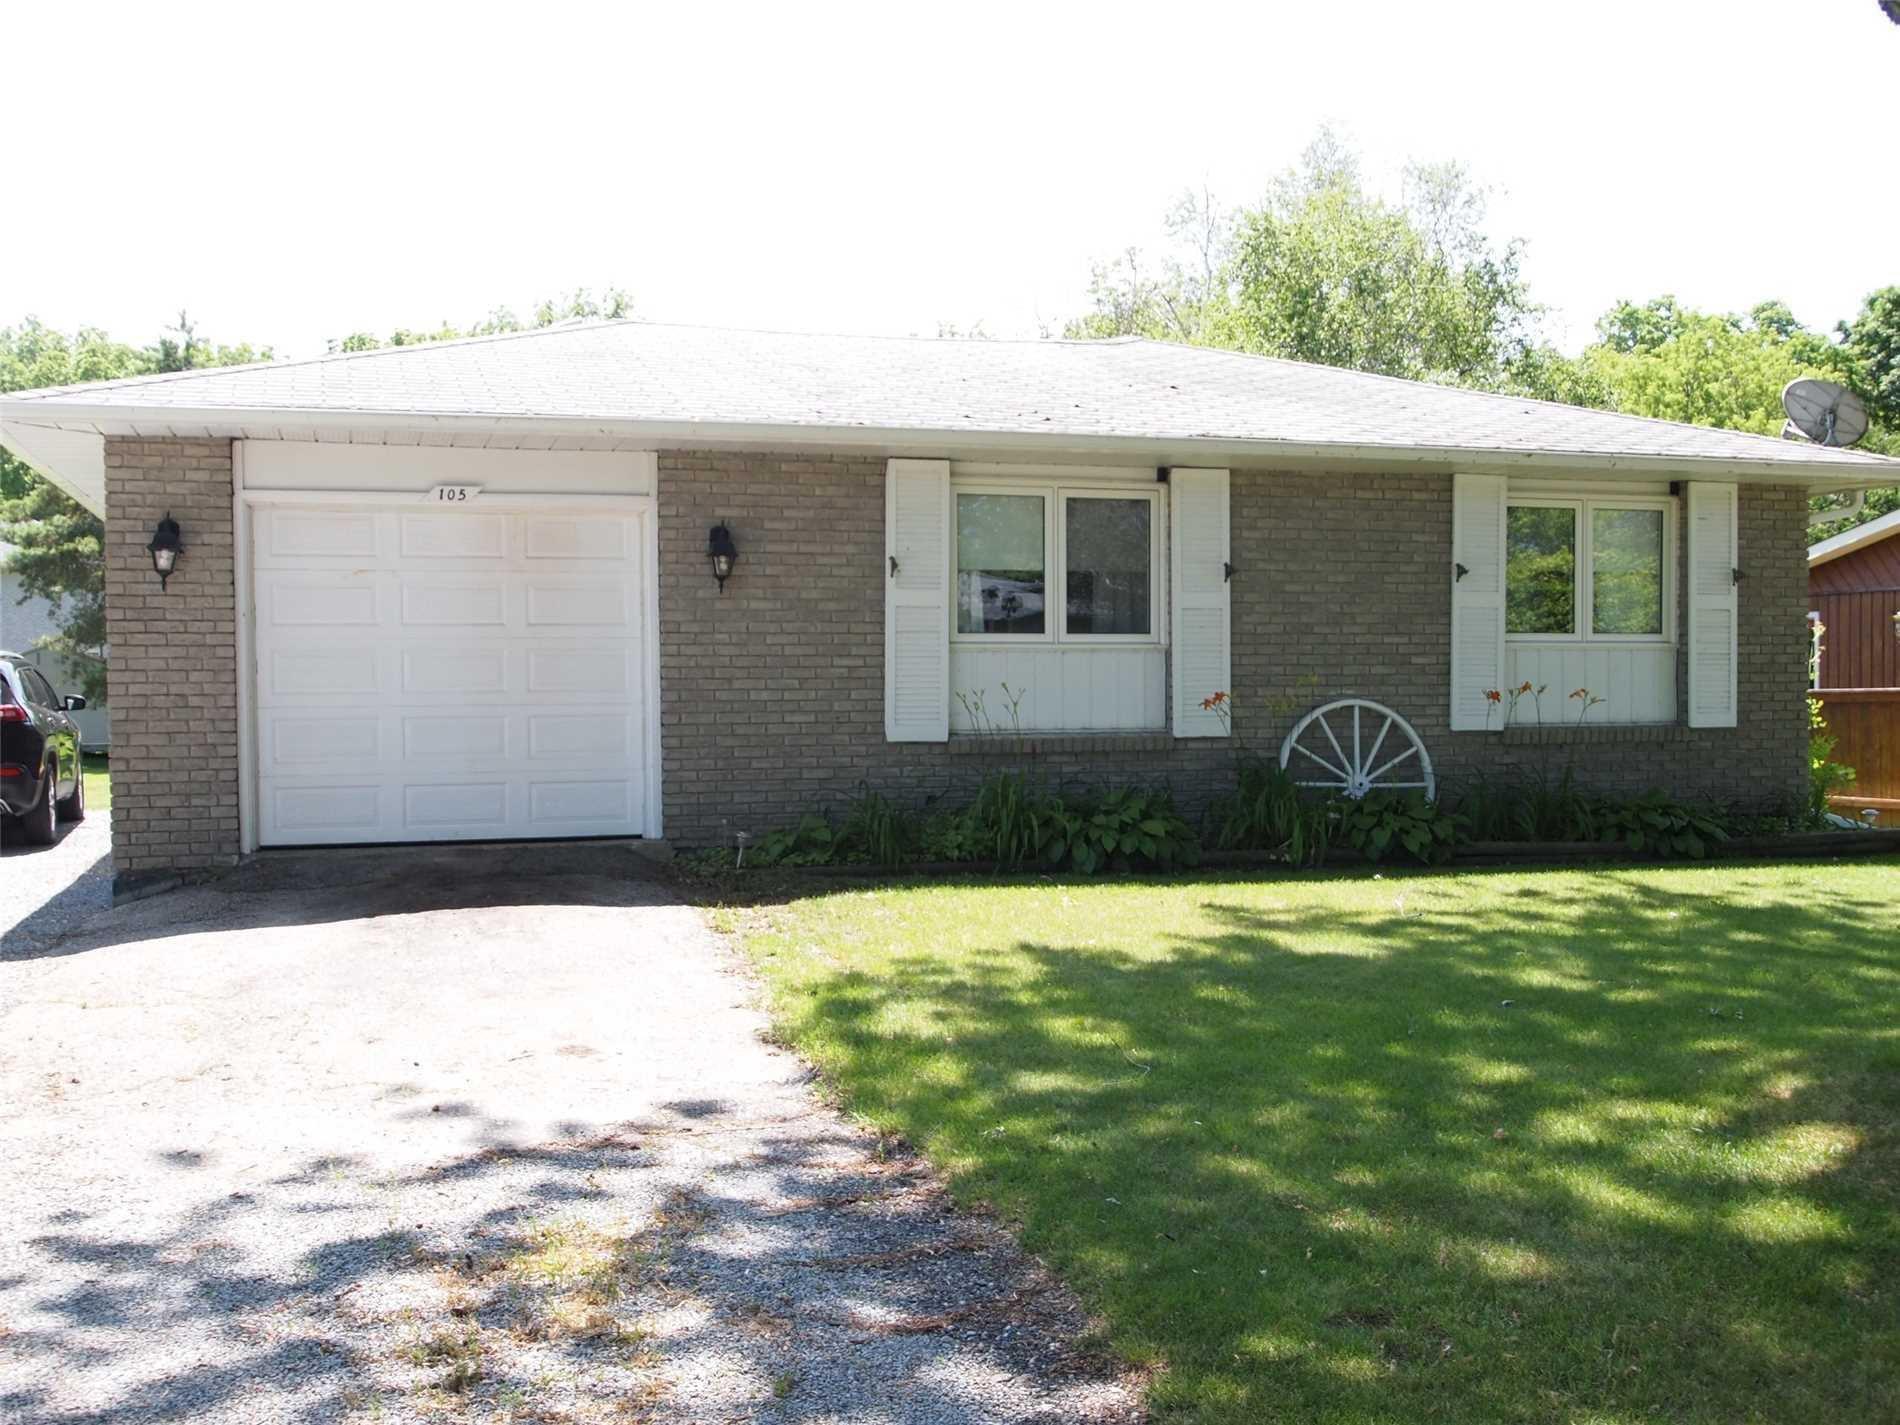 Photo 2: Photos: 105 Fifth Street in Brock: Beaverton House (Bungalow) for sale : MLS®# N4564596